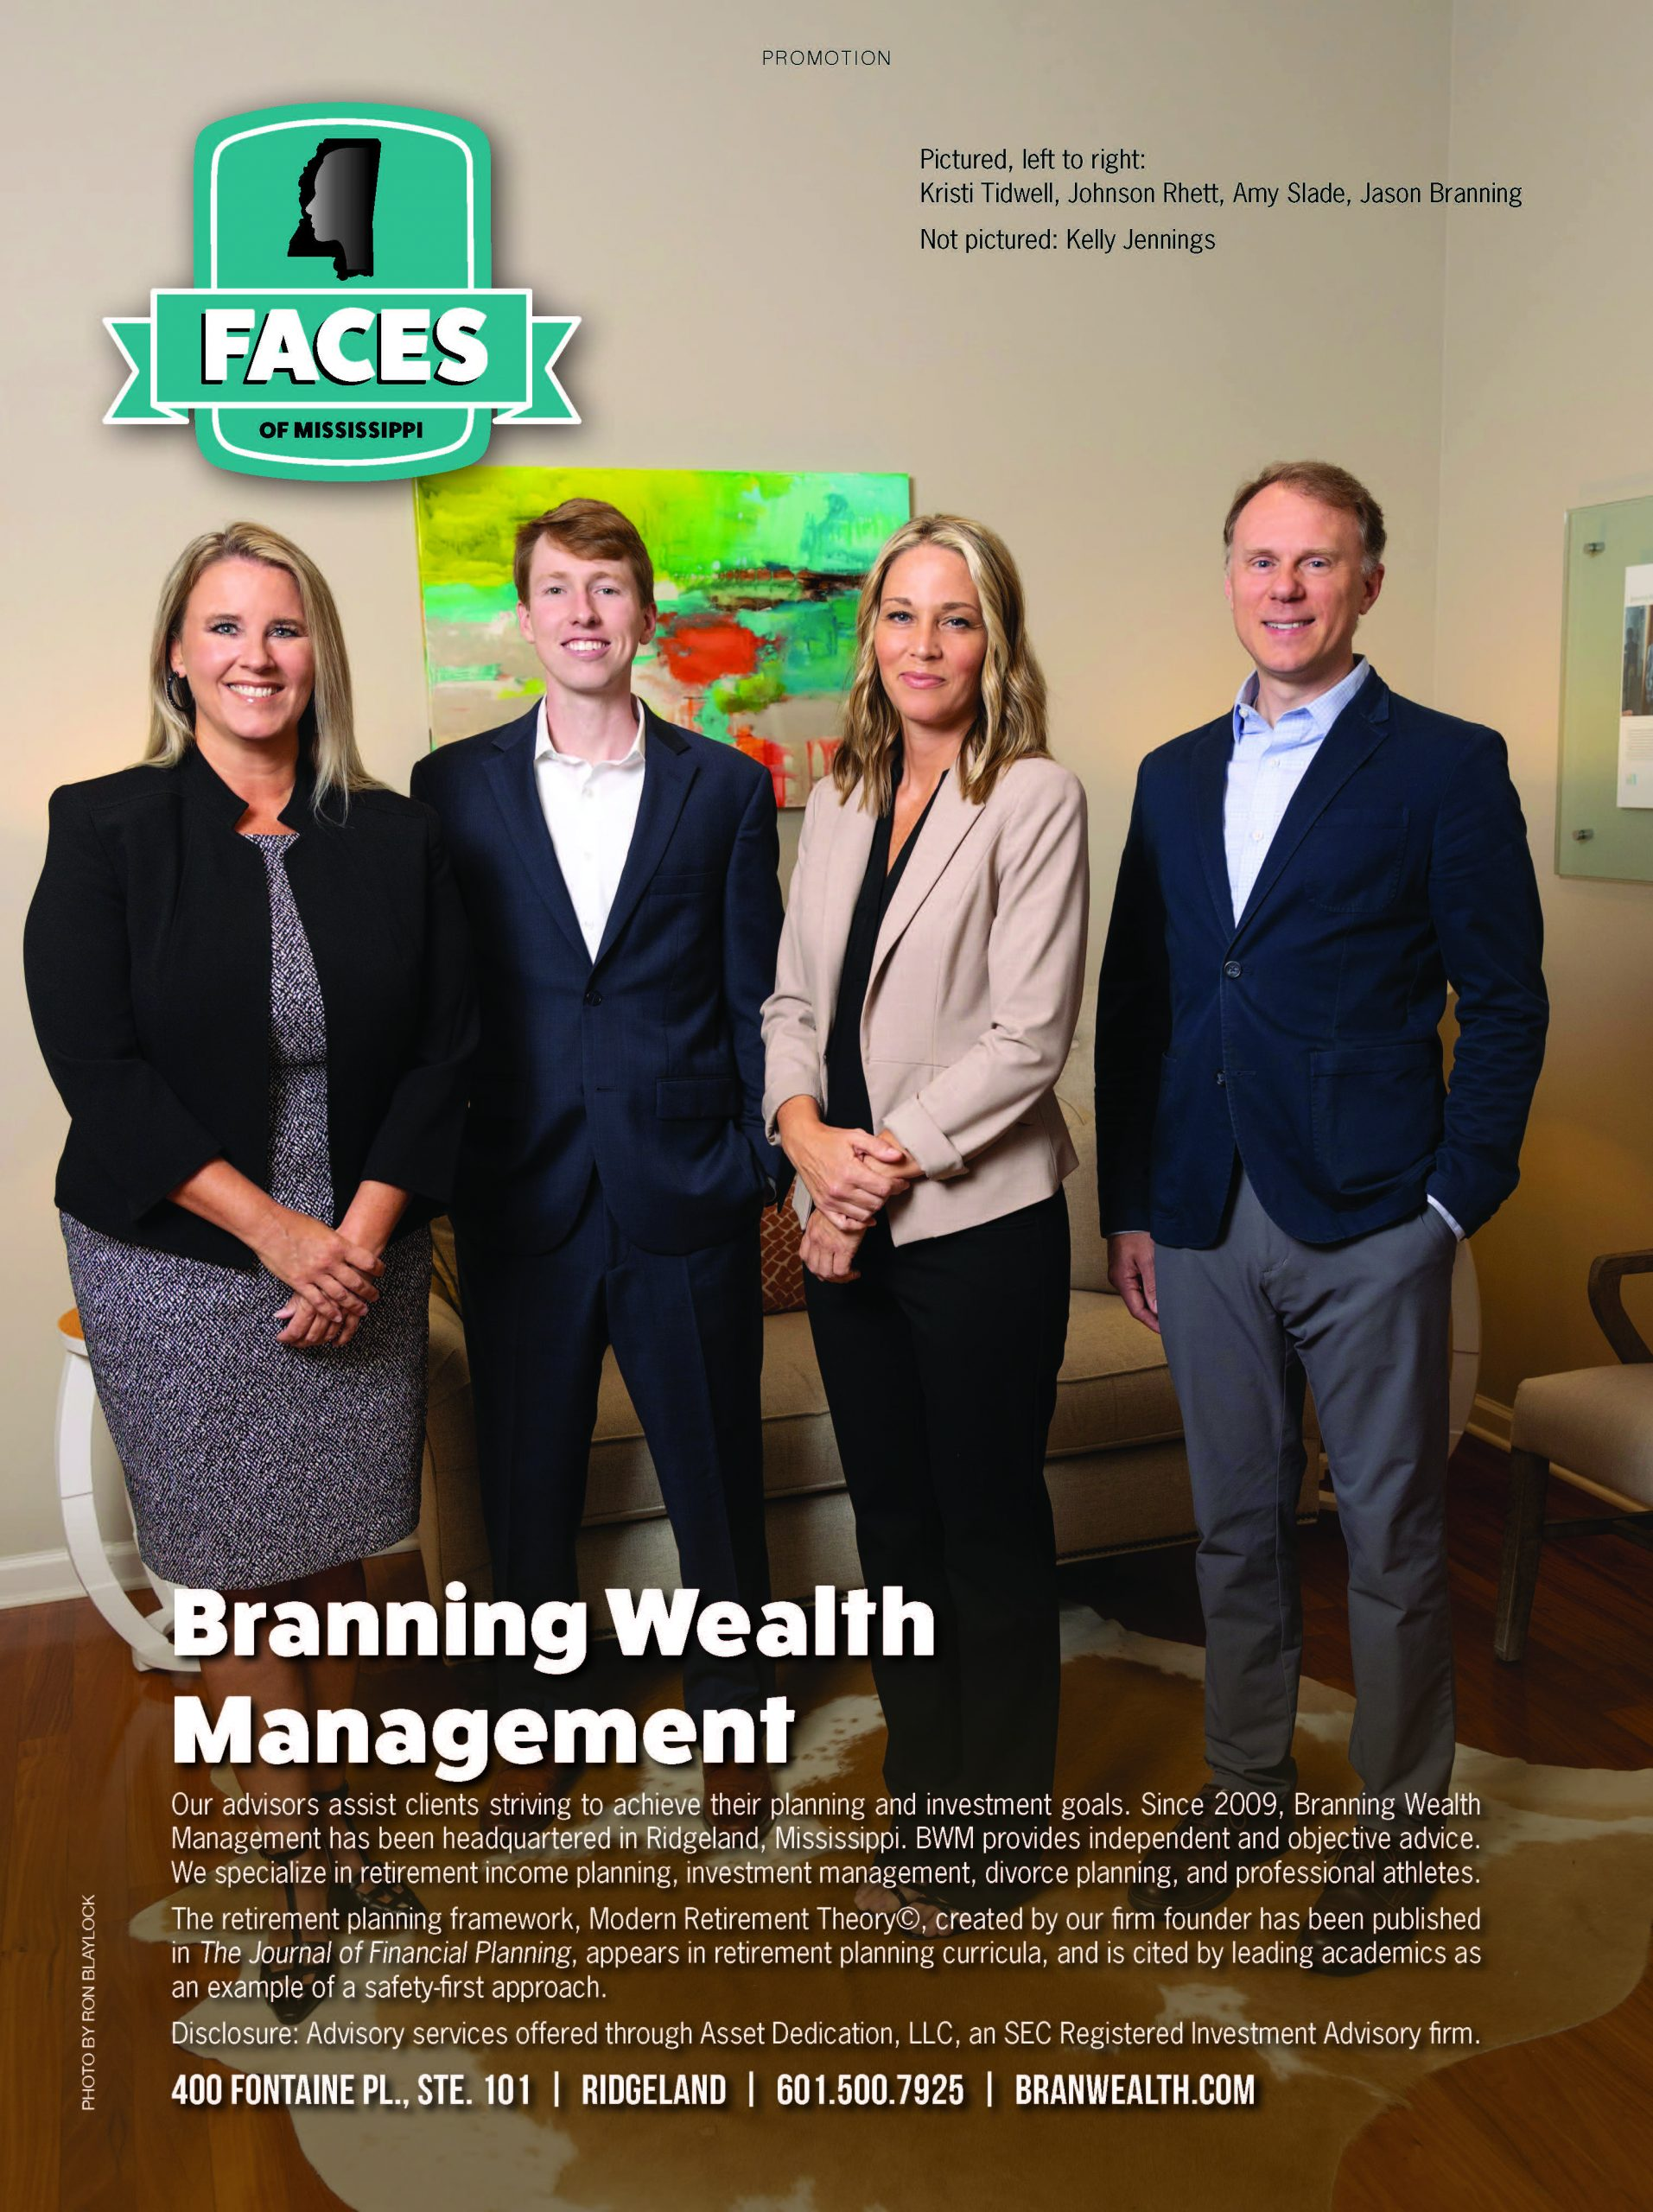 Branning Wealth SO21 Full FACES R.2